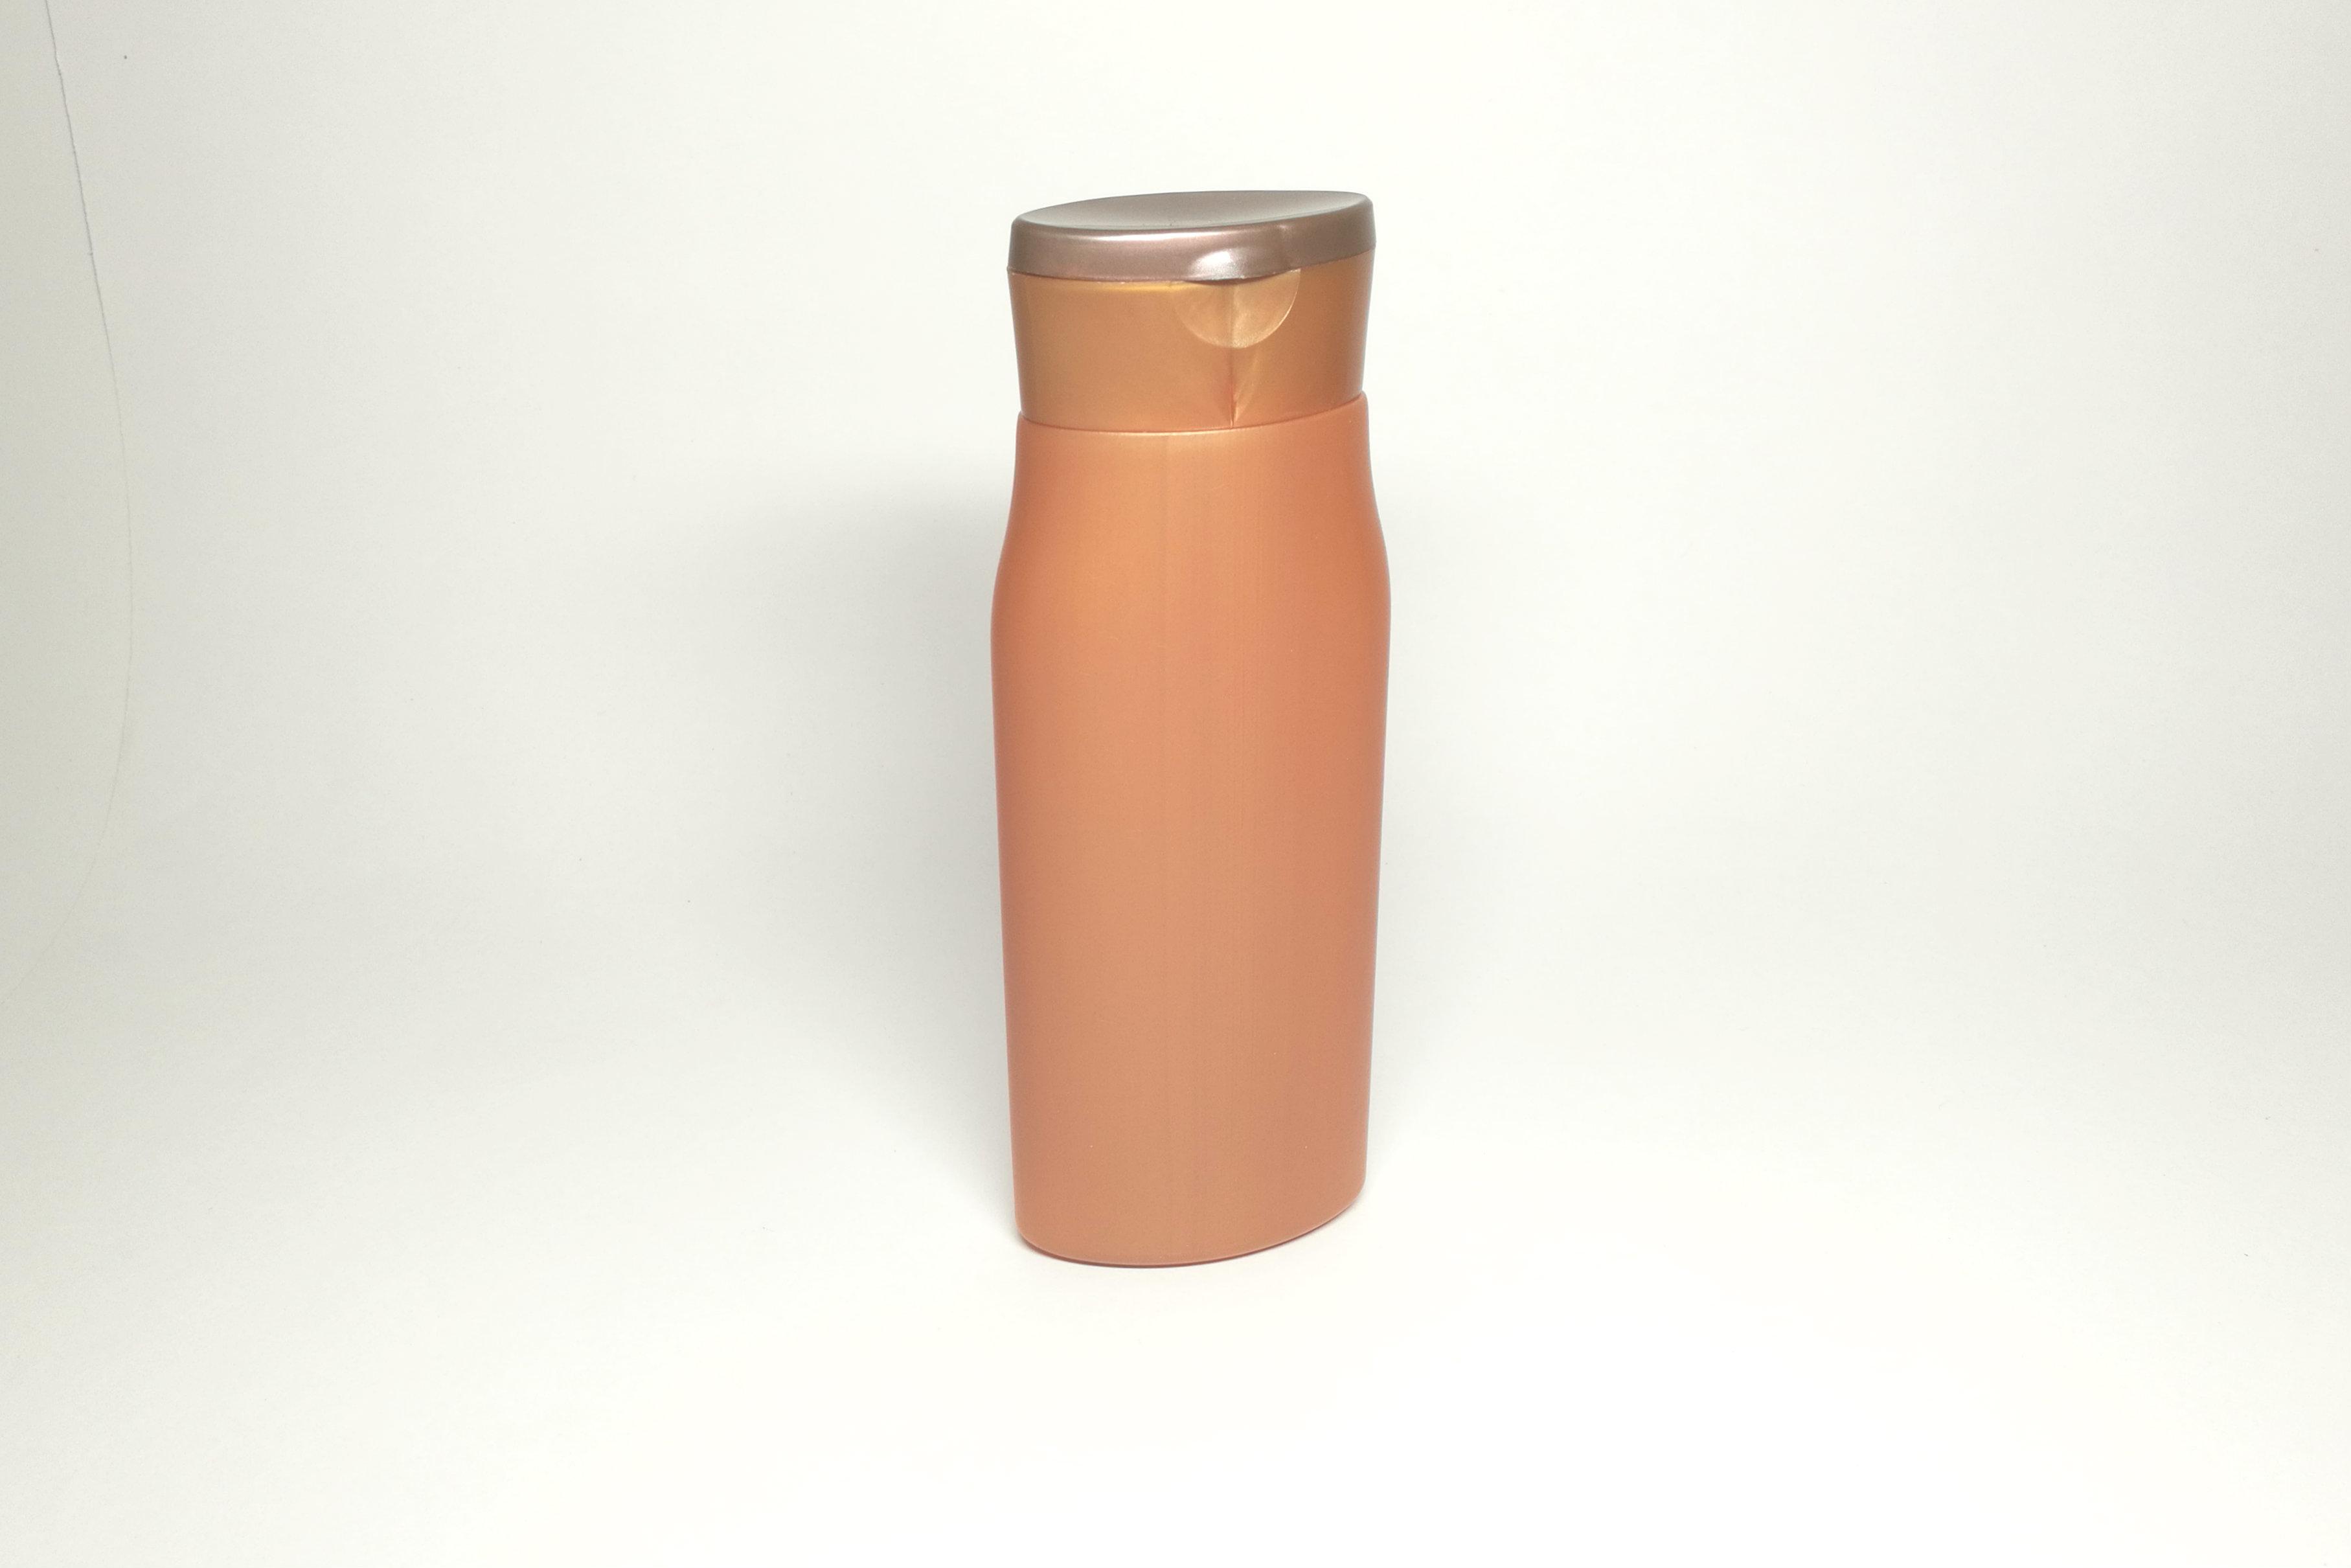 Shampoo Bottle